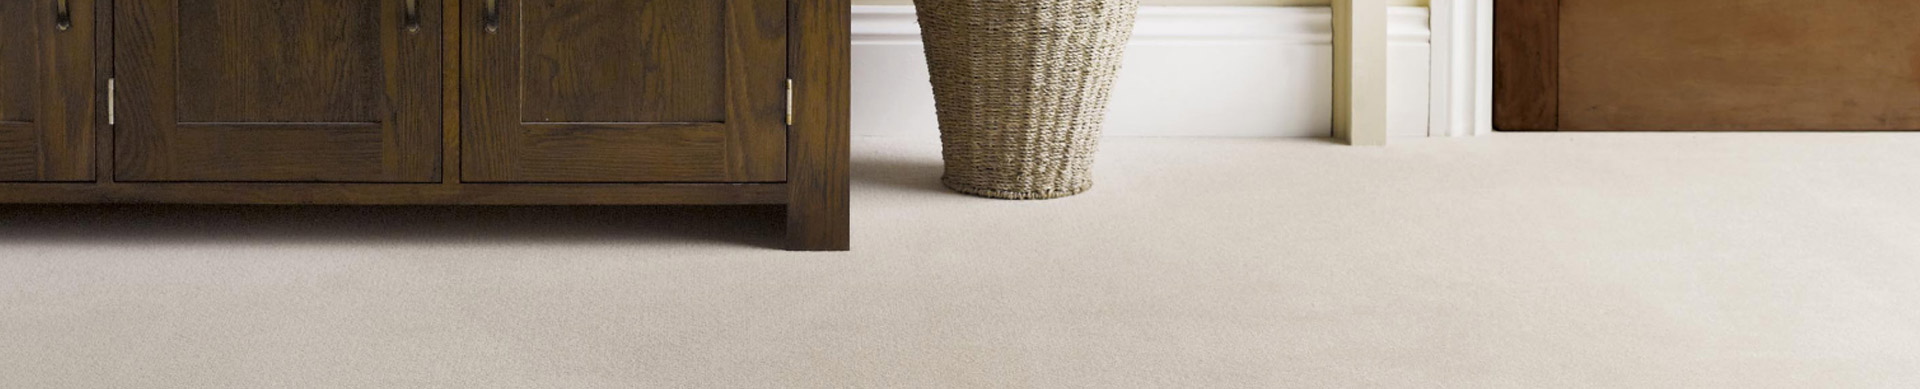 Guernsey Carpets Header